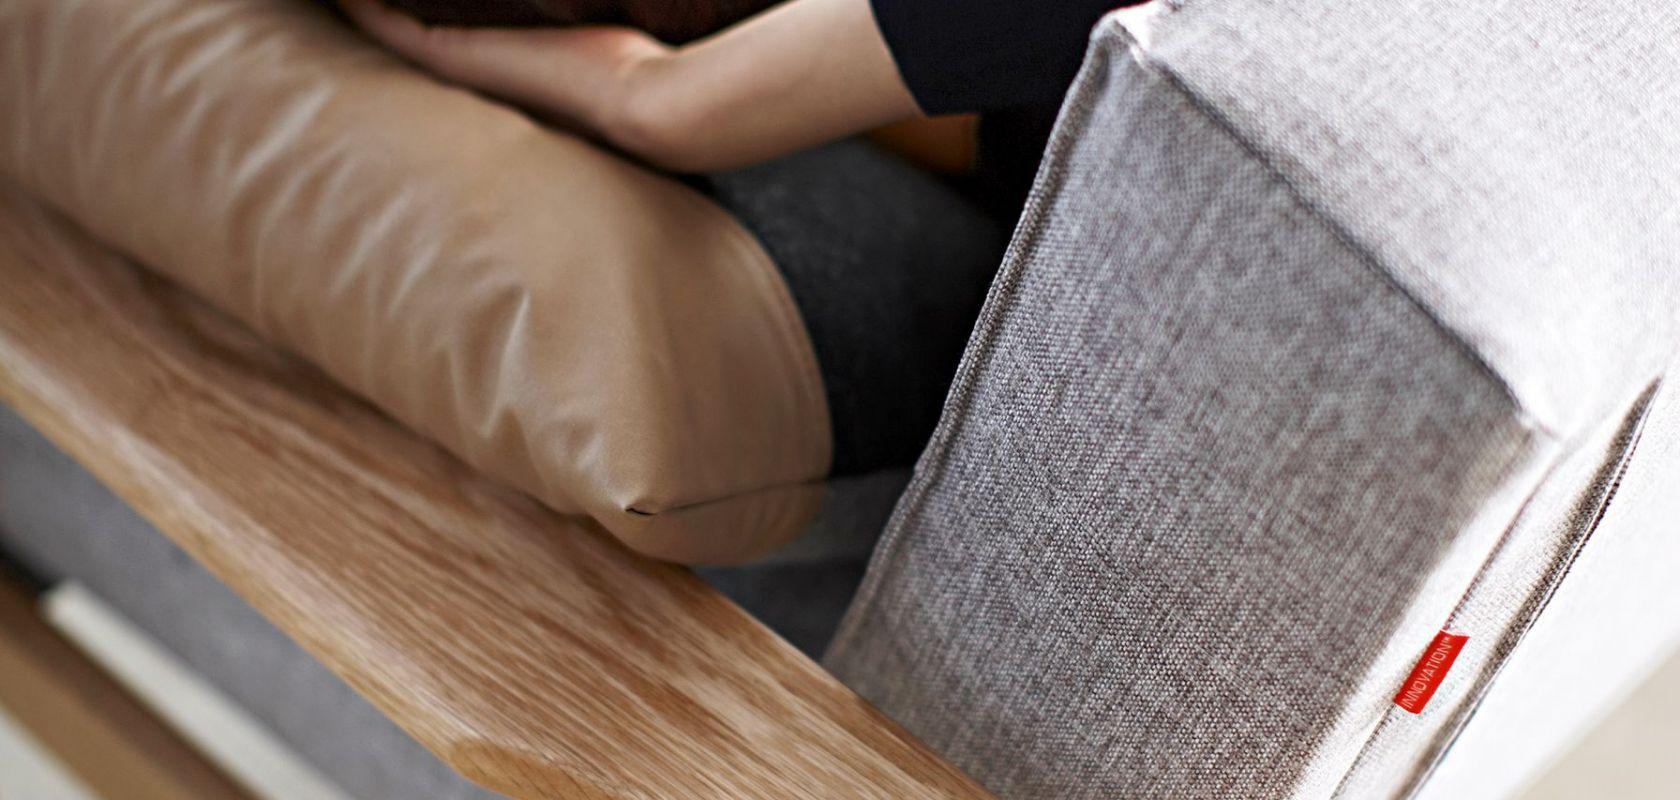 Istyle 2015 Splitback Sofa Bed With Frej Armrests Lacqured Oak 521 Mixed Dance Grey Sofa Position Model 02